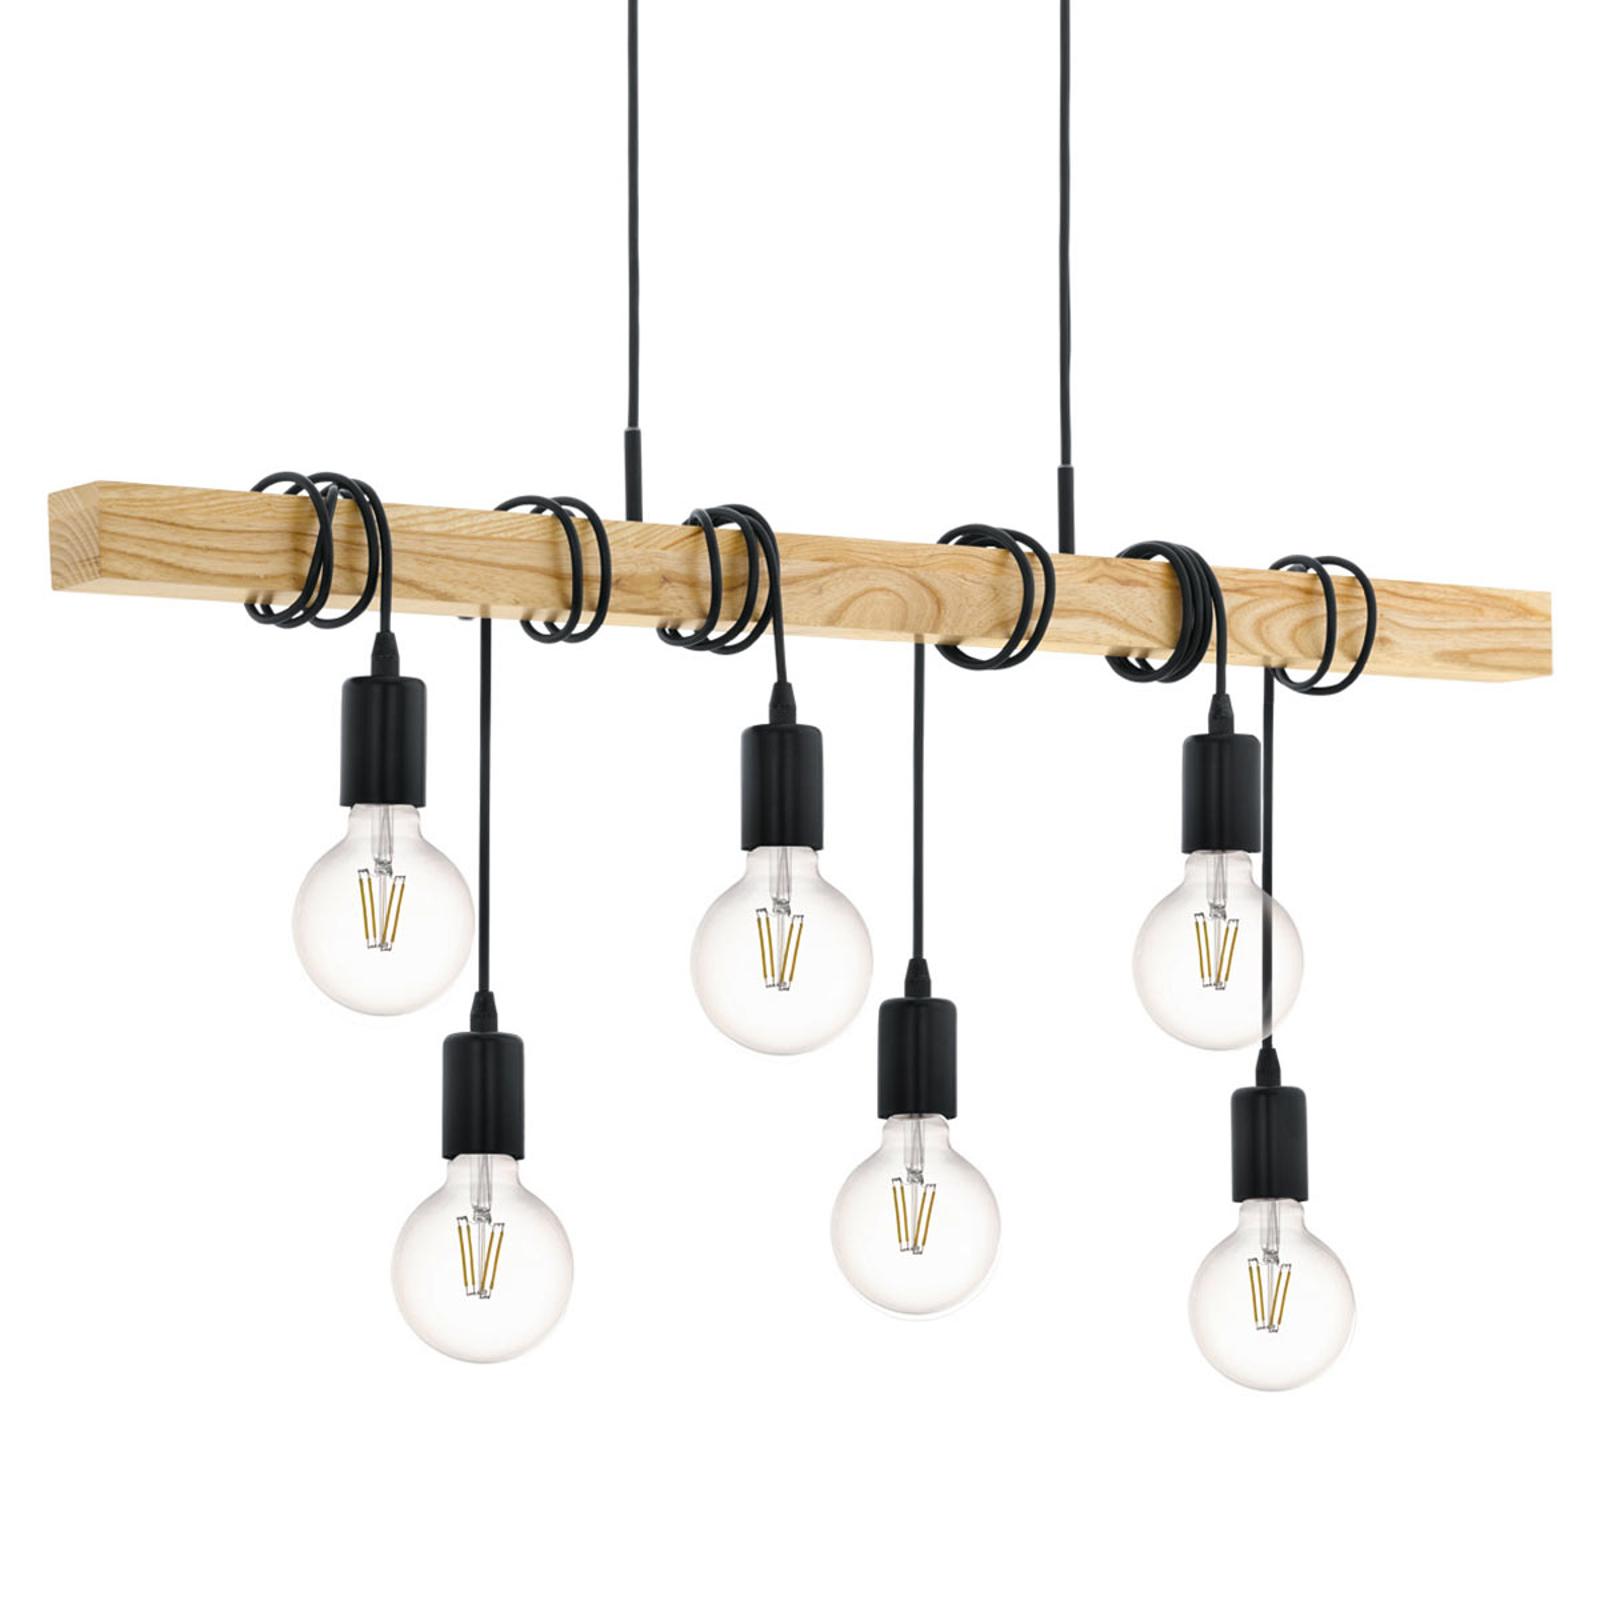 Lampada a sospensione Townshend, legno, 6 luci